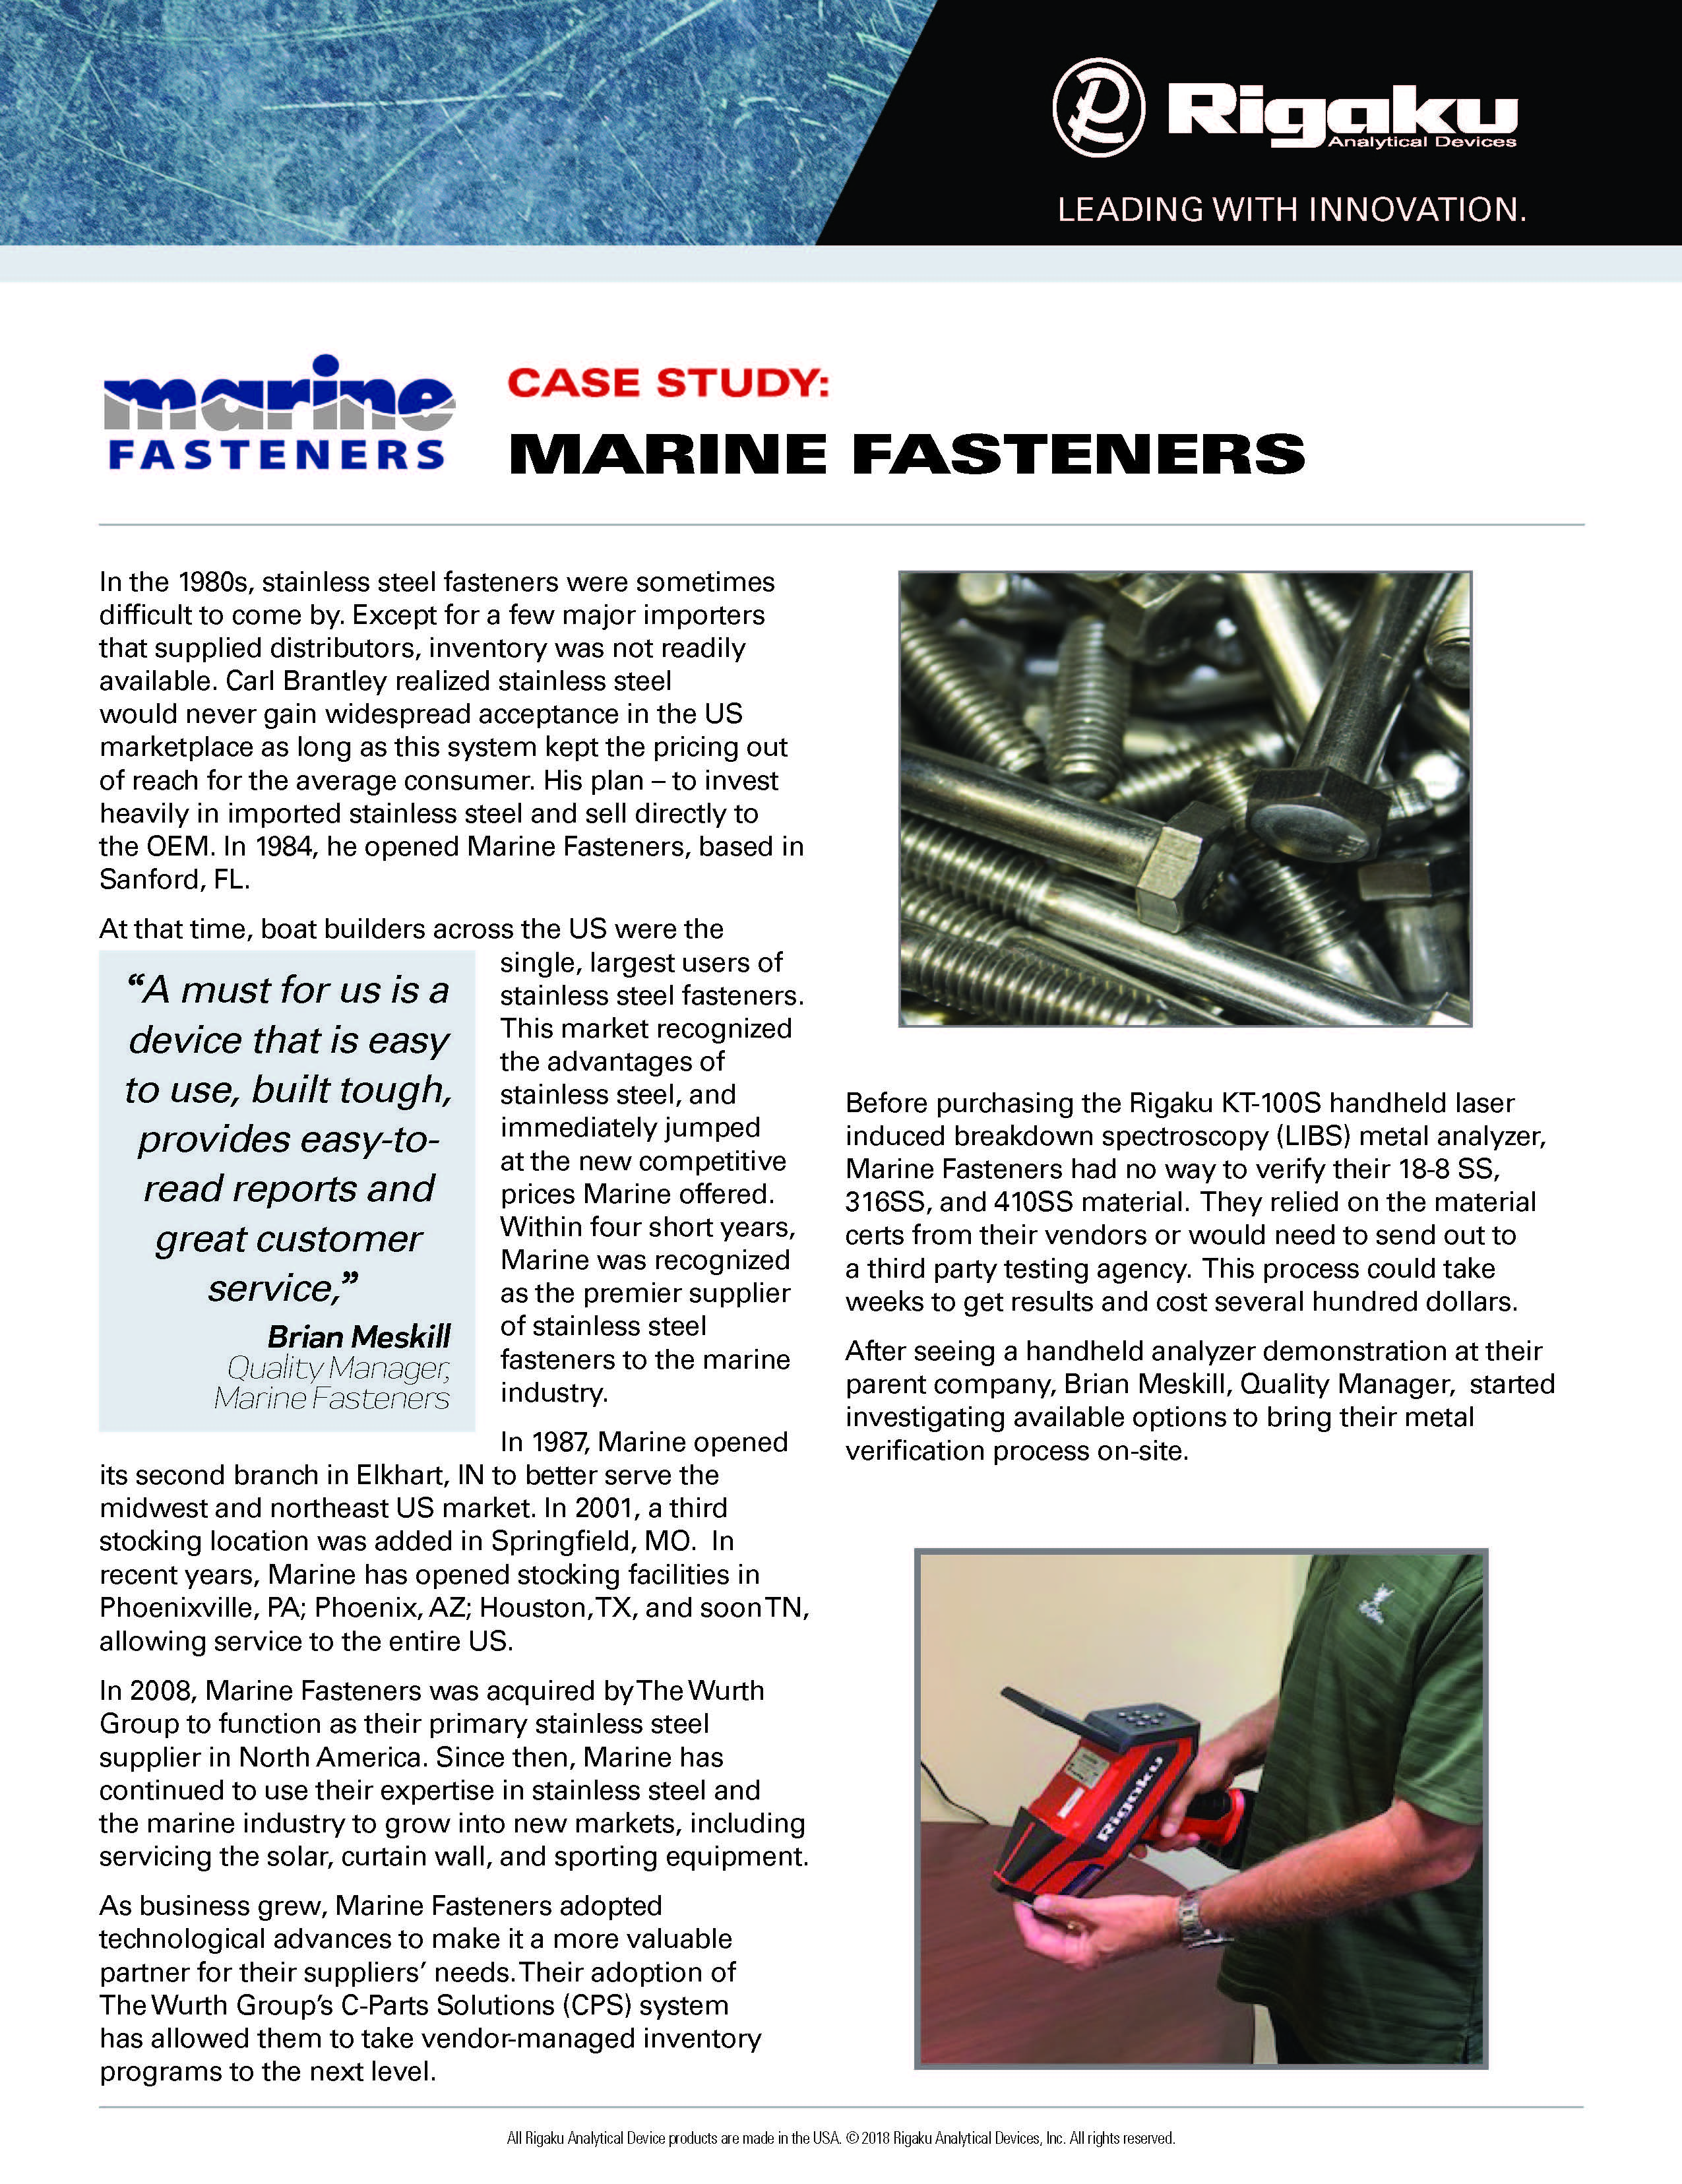 Marine Fasteners Case Study 2019Oct02_Page_1